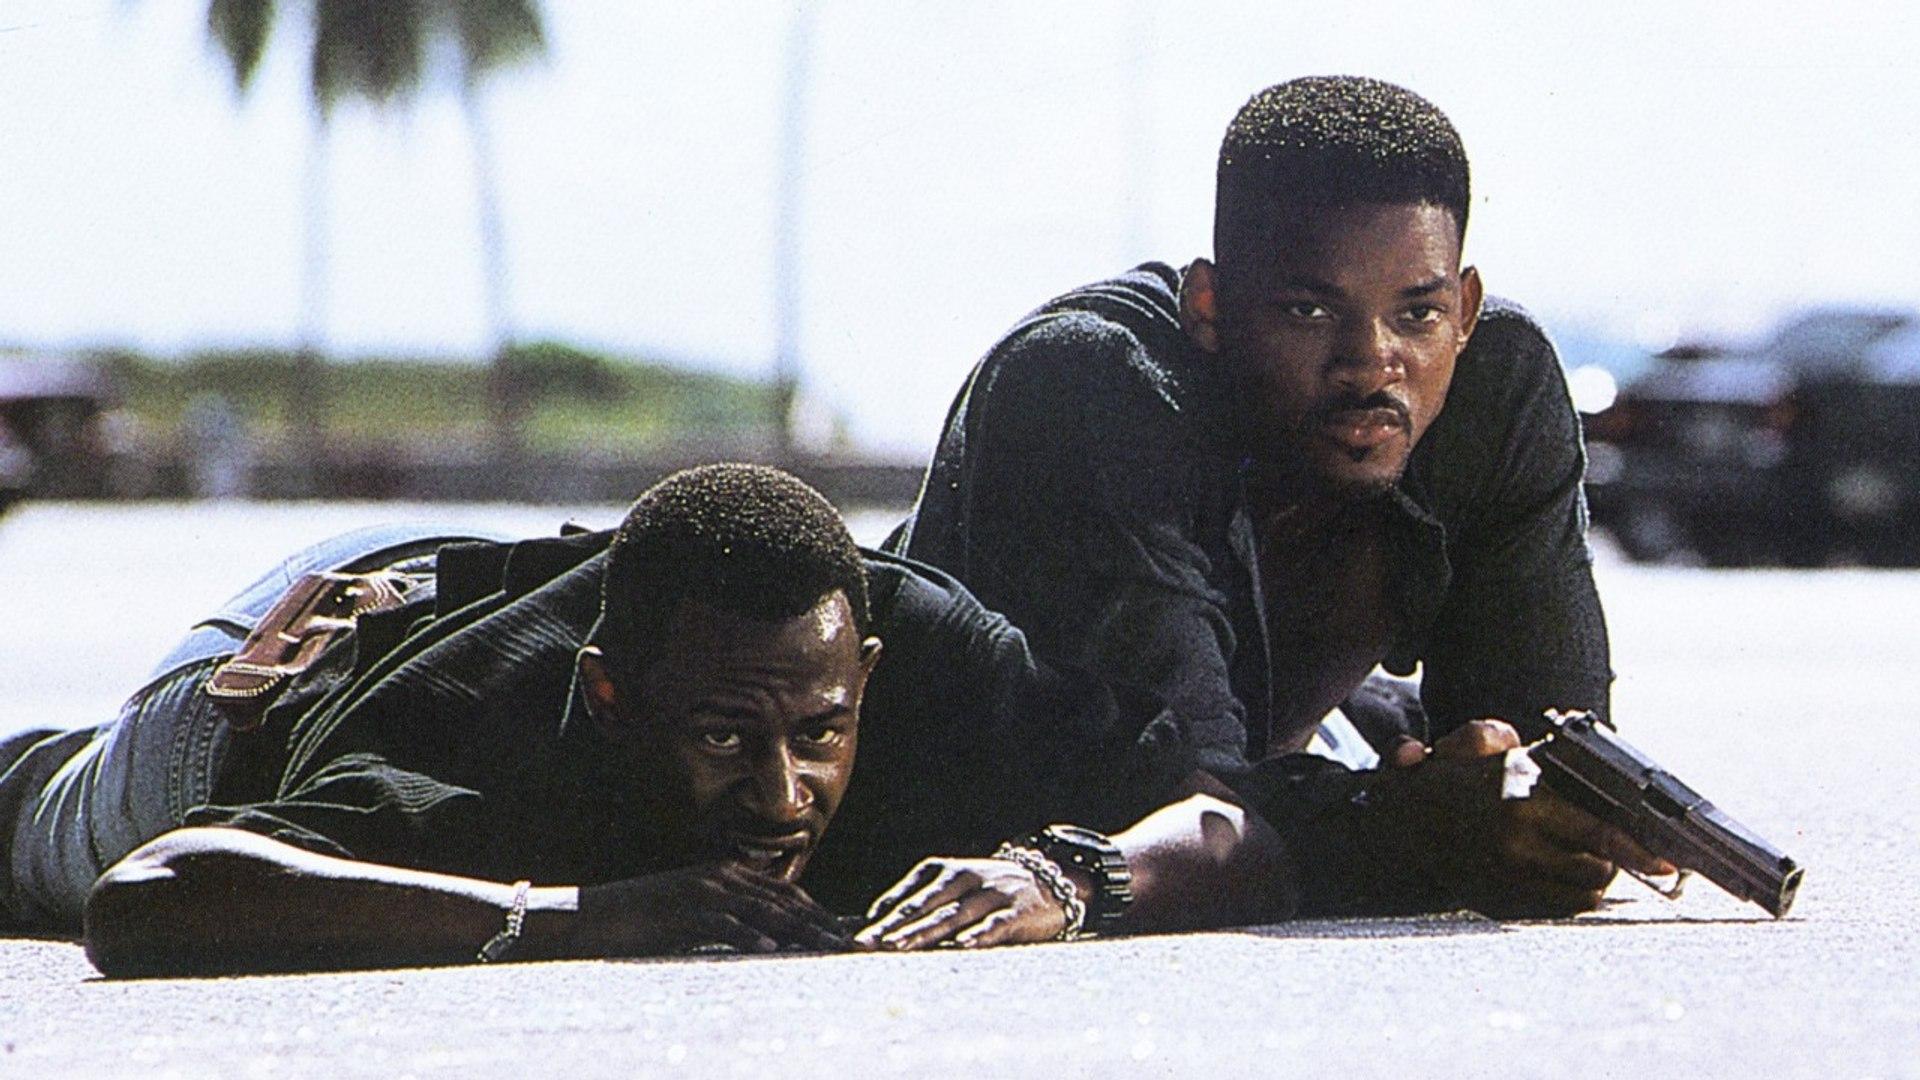 NBC Passes On 'Bad Boys' TV Spinoff Series